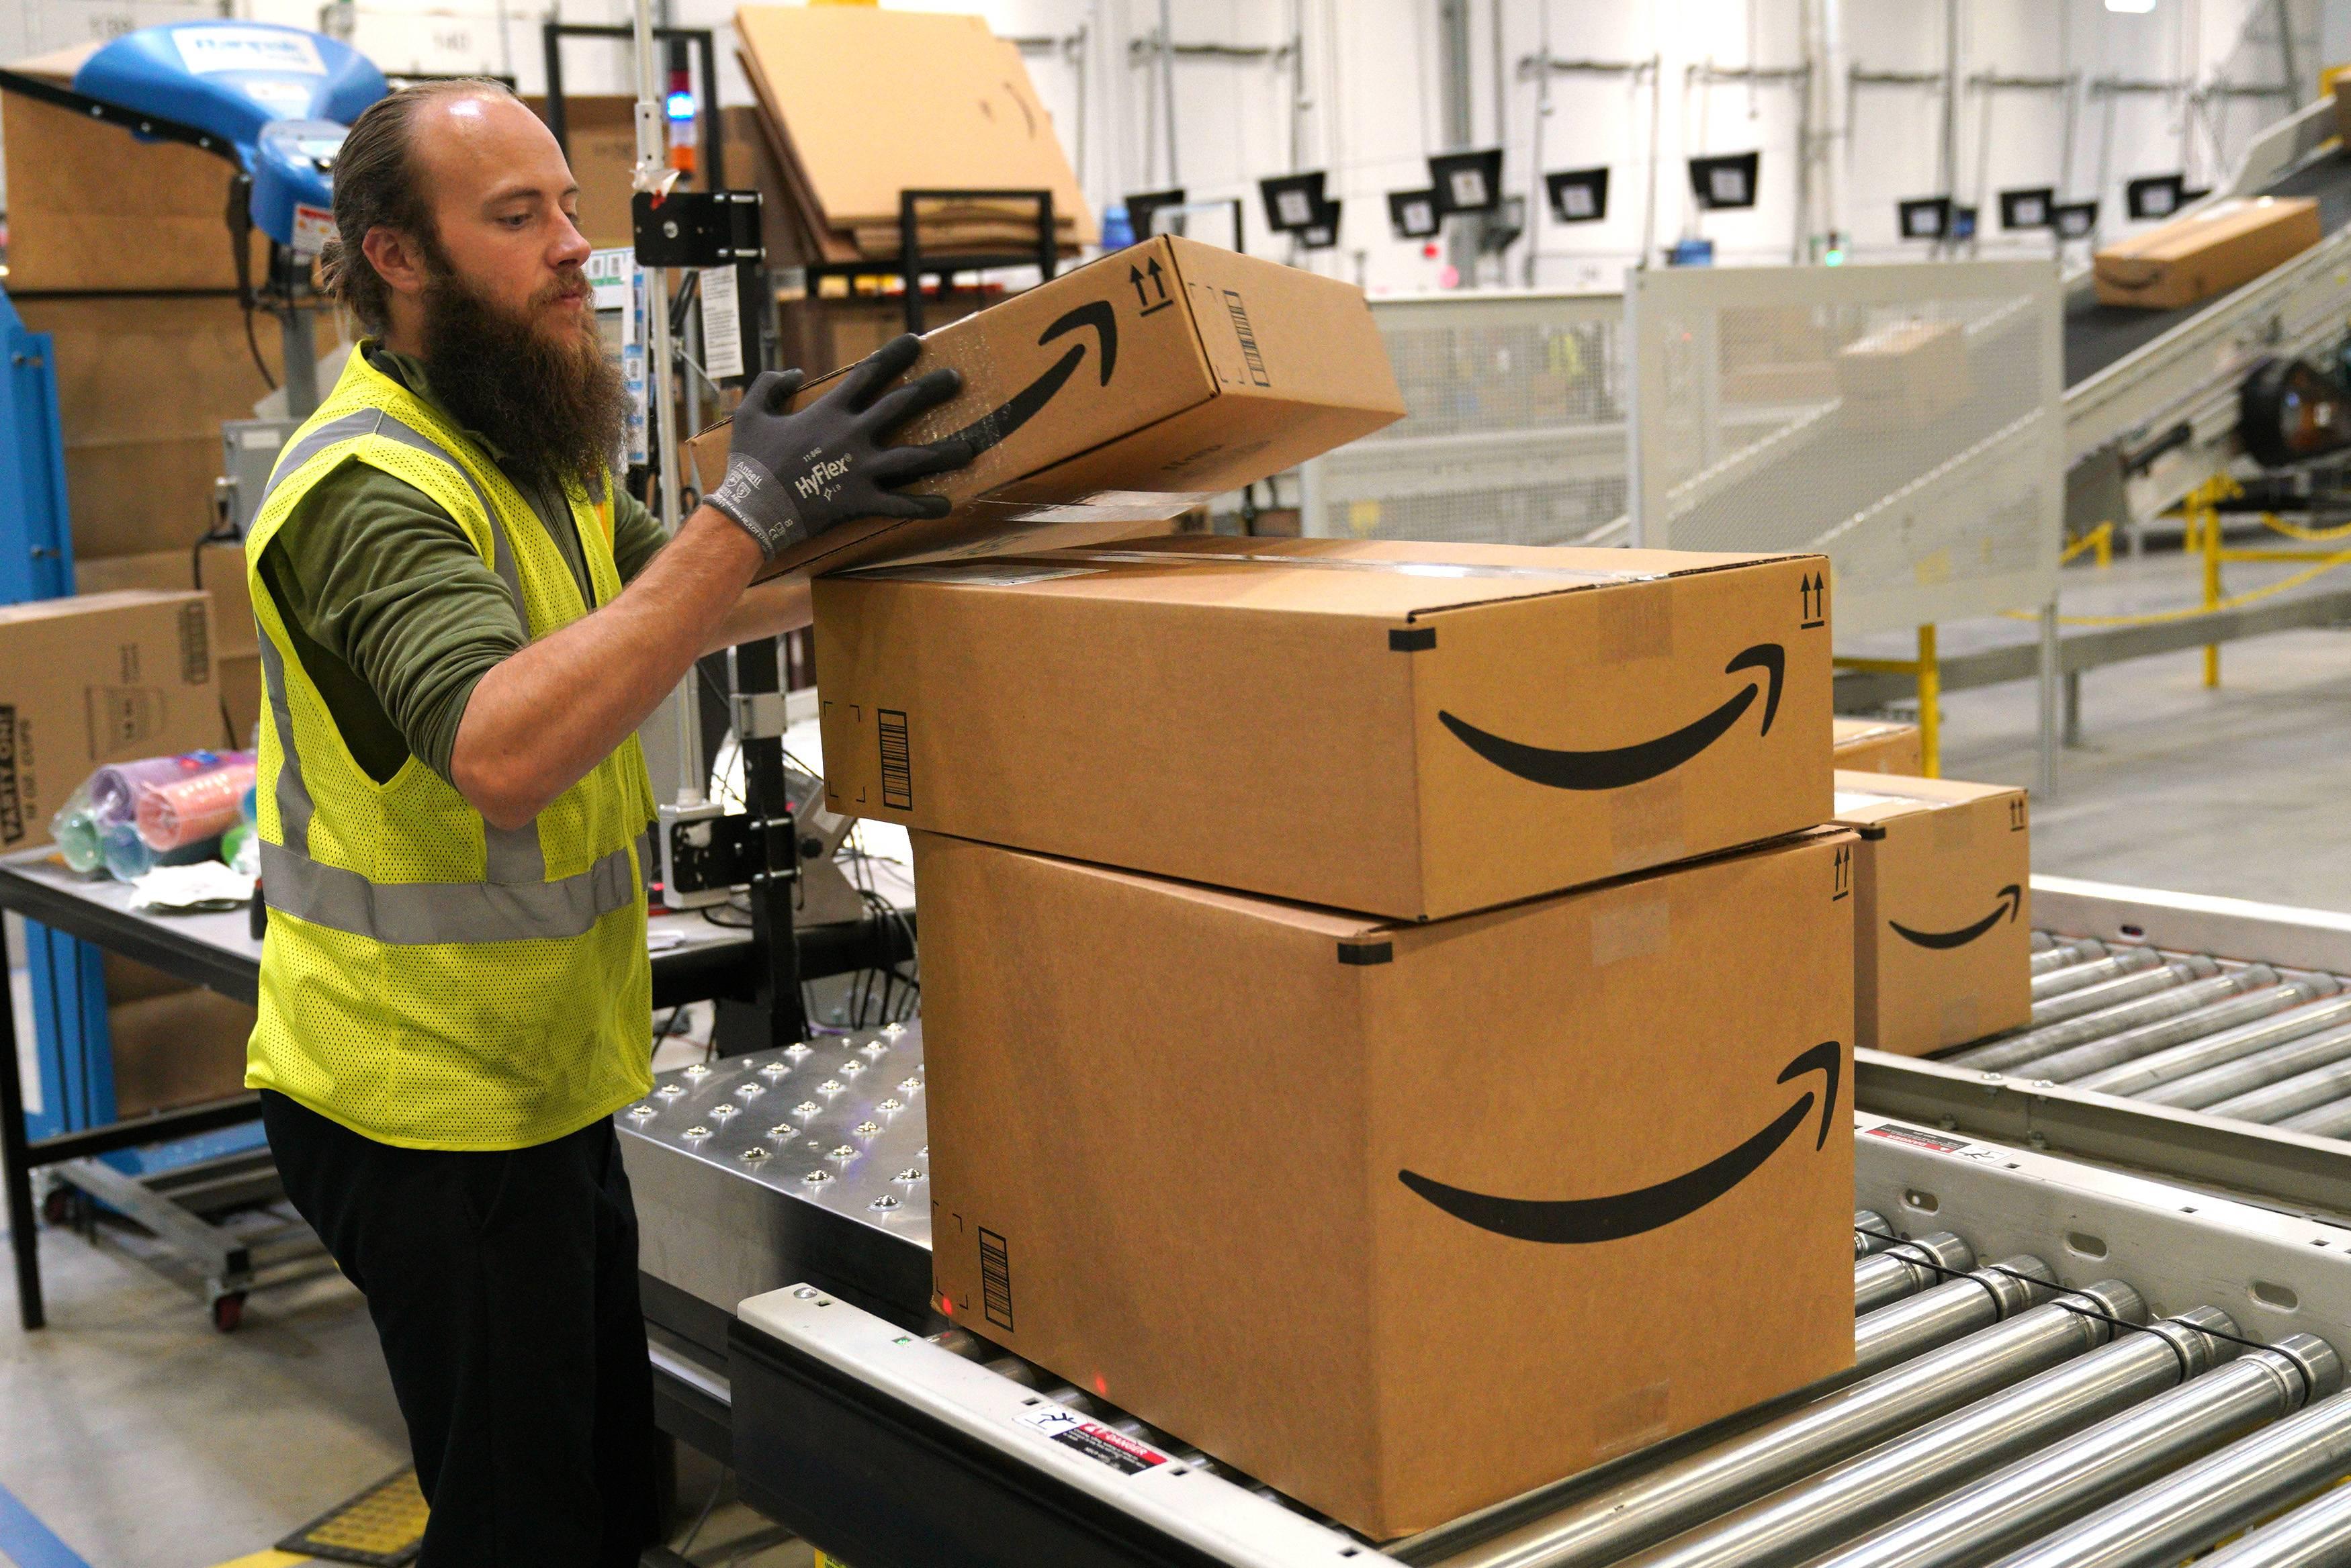 Amazon Millenials